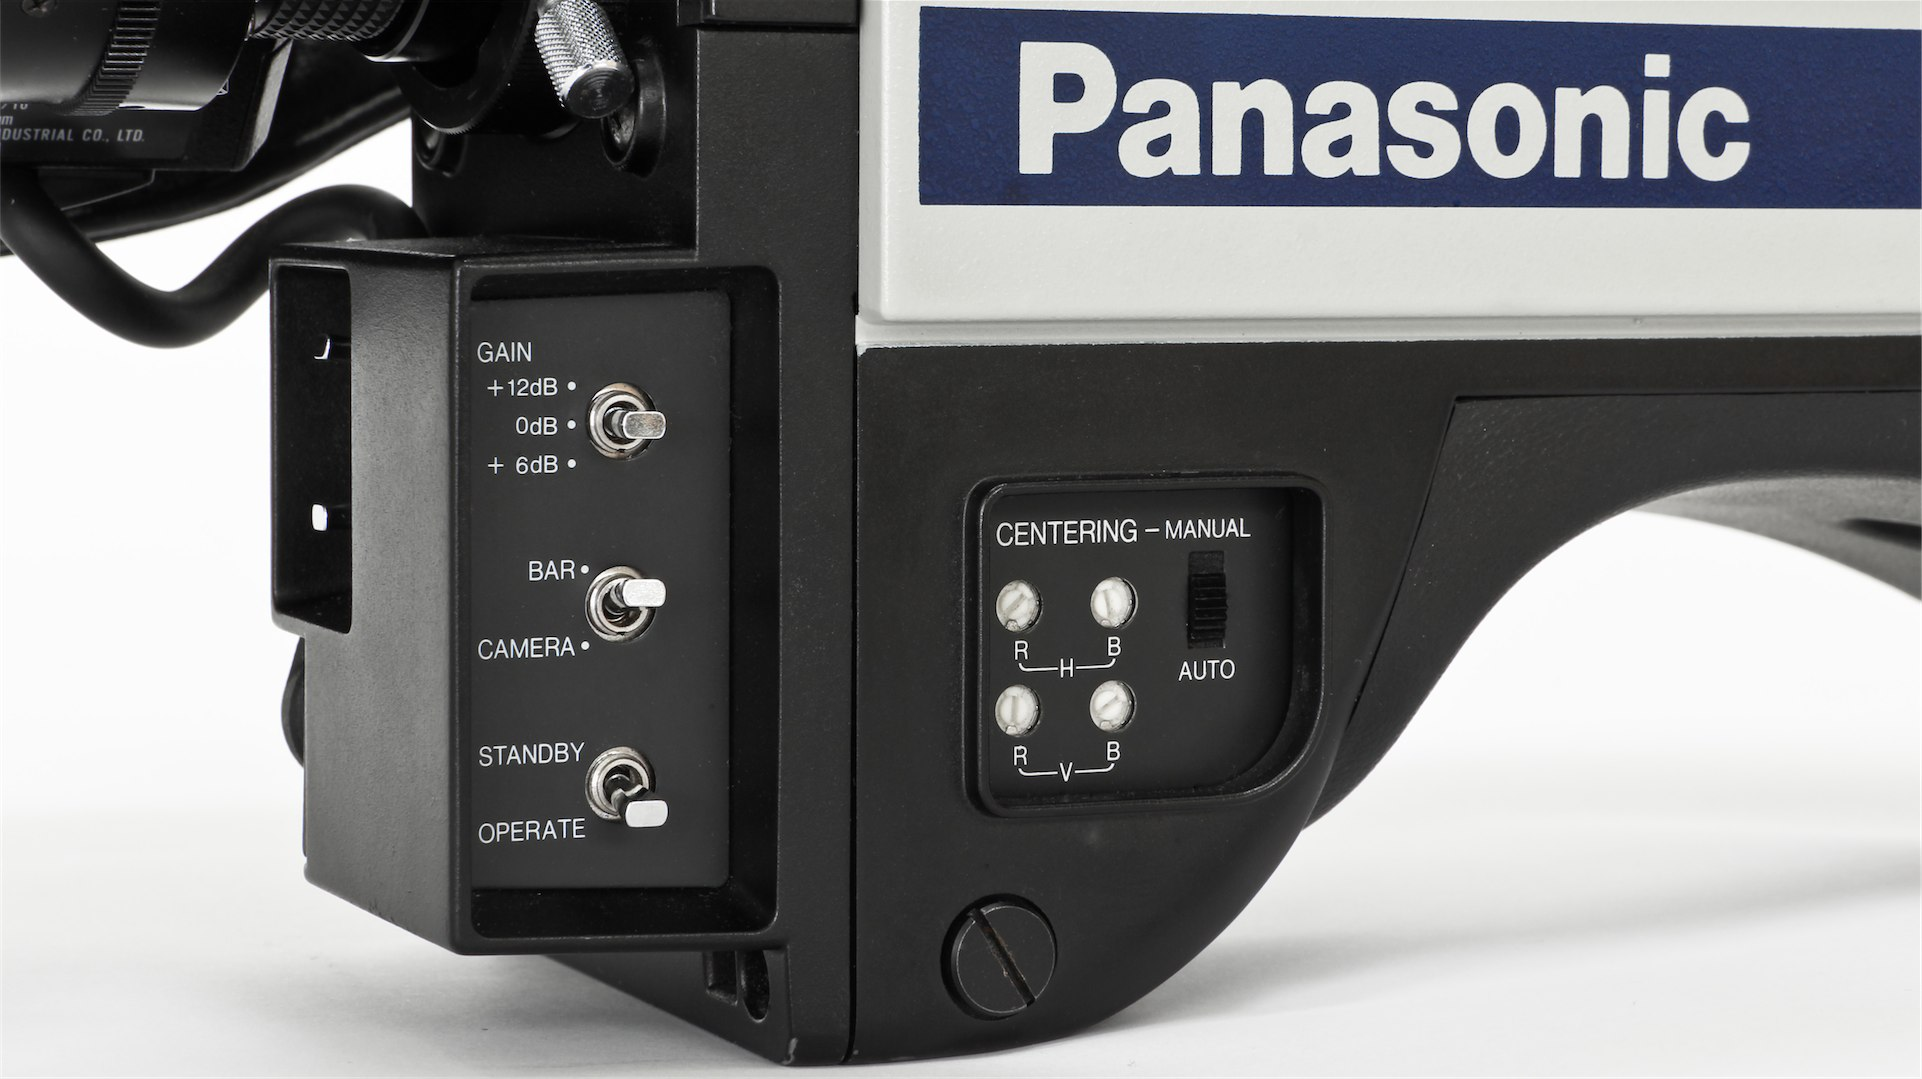 Panasonic WV-555 -  (5 von 19)_1